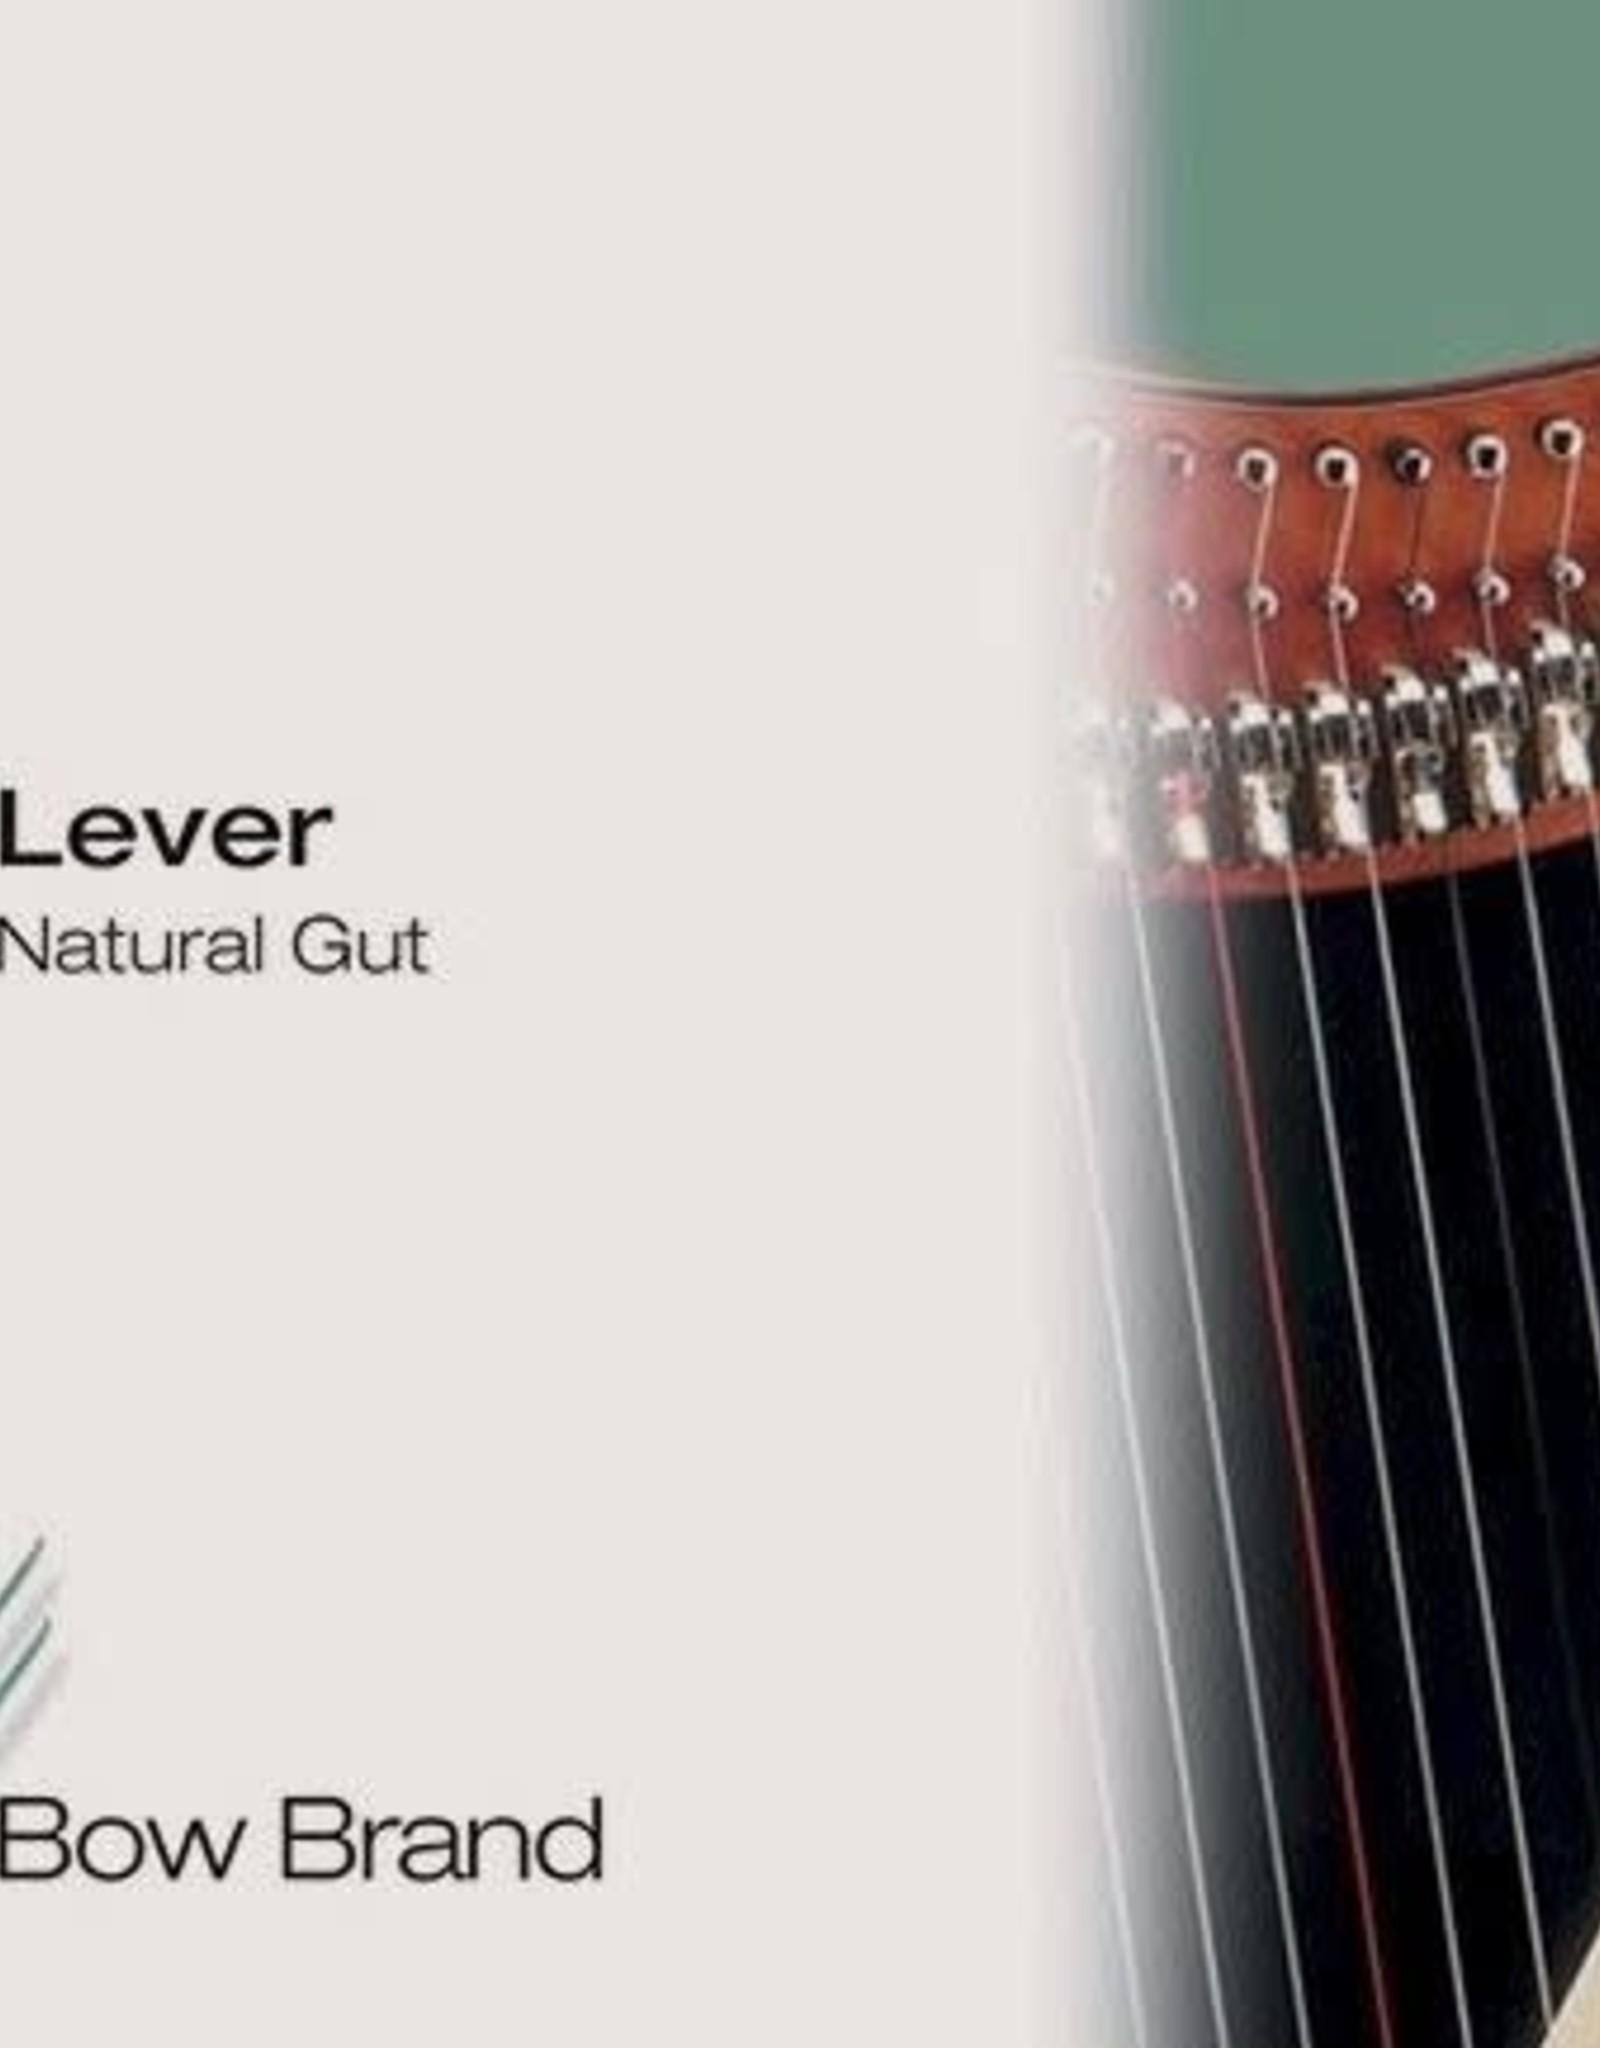 BOW BRAND  klep darm - lever GUT 24/4 do